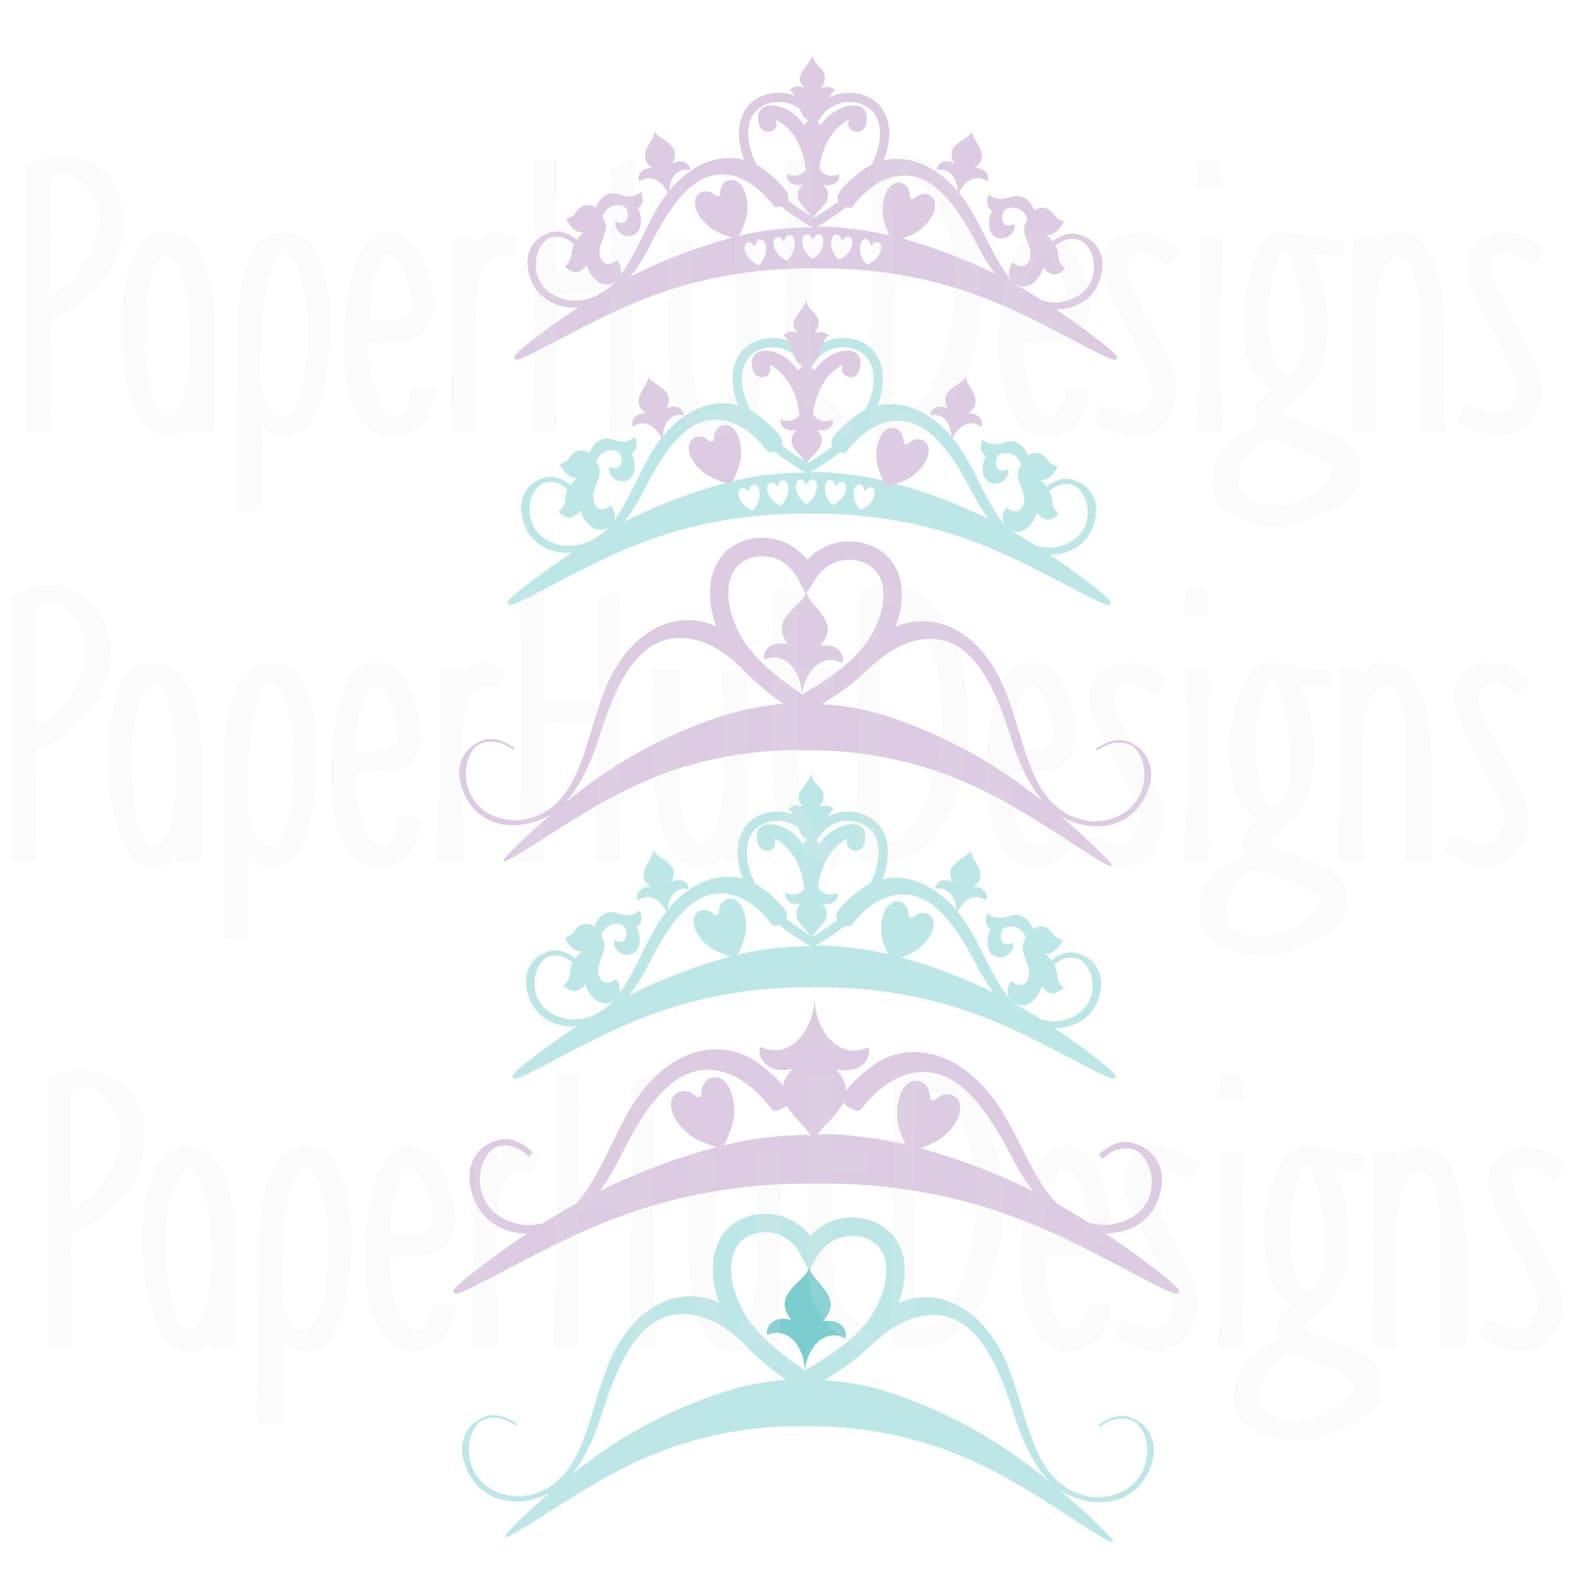 ballerina clipart-ballet clipart-ballerina clip art & digital paper set-lavender-aqua-ballet shoes-flowers-floral-tiara-buy2get1